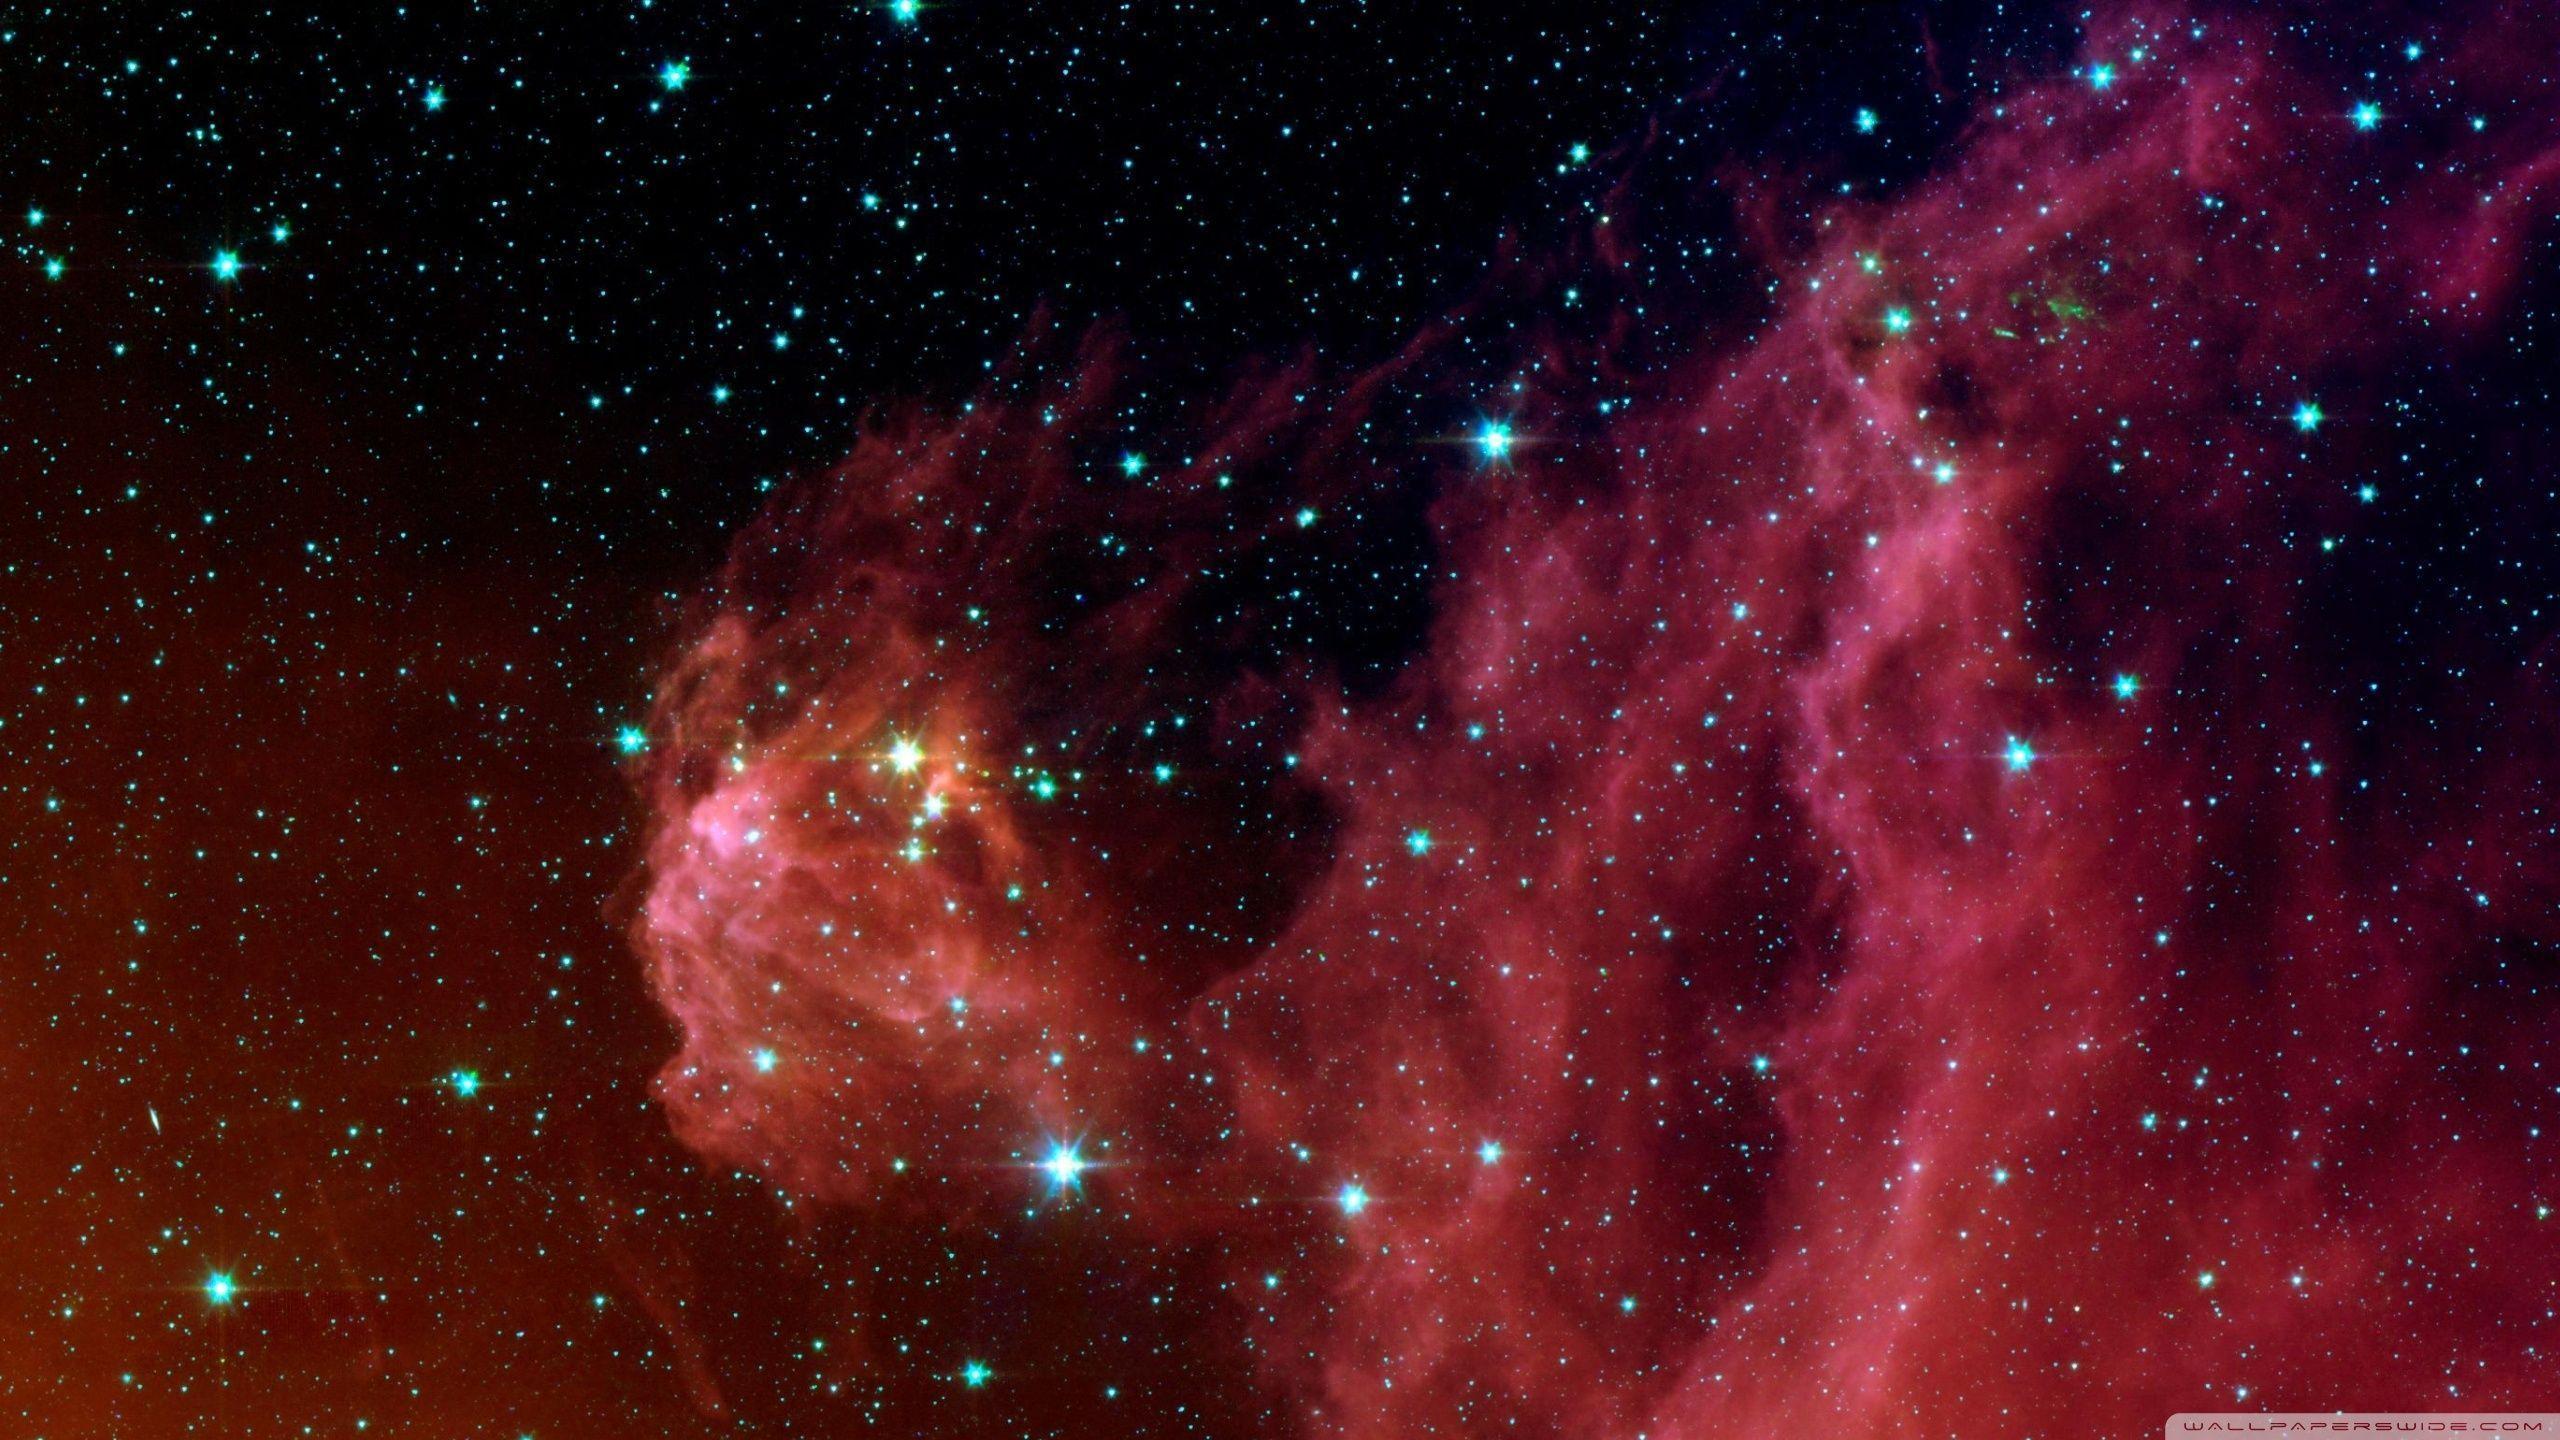 Red Galaxy 4k Ultra Hd Wallpapers Top Free Red Galaxy 4k Ultra